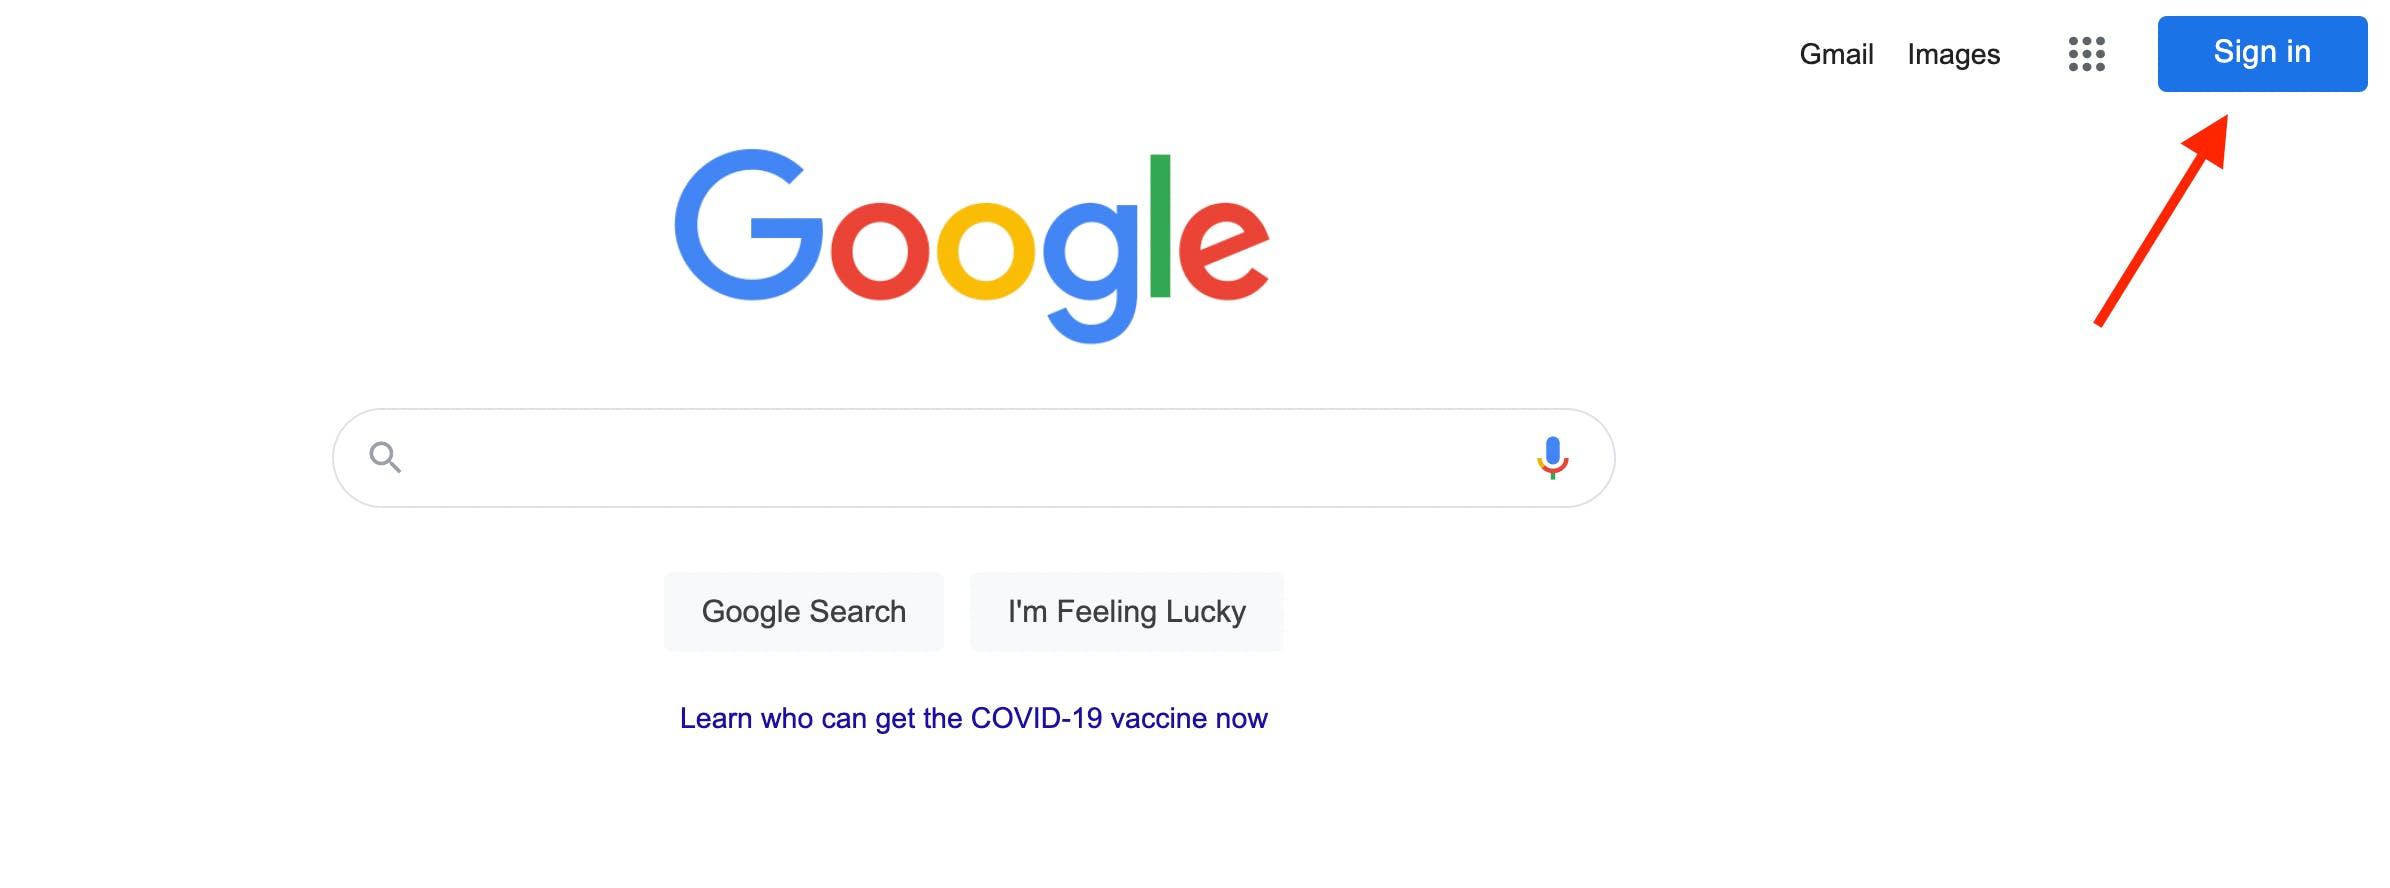 Google create account page.